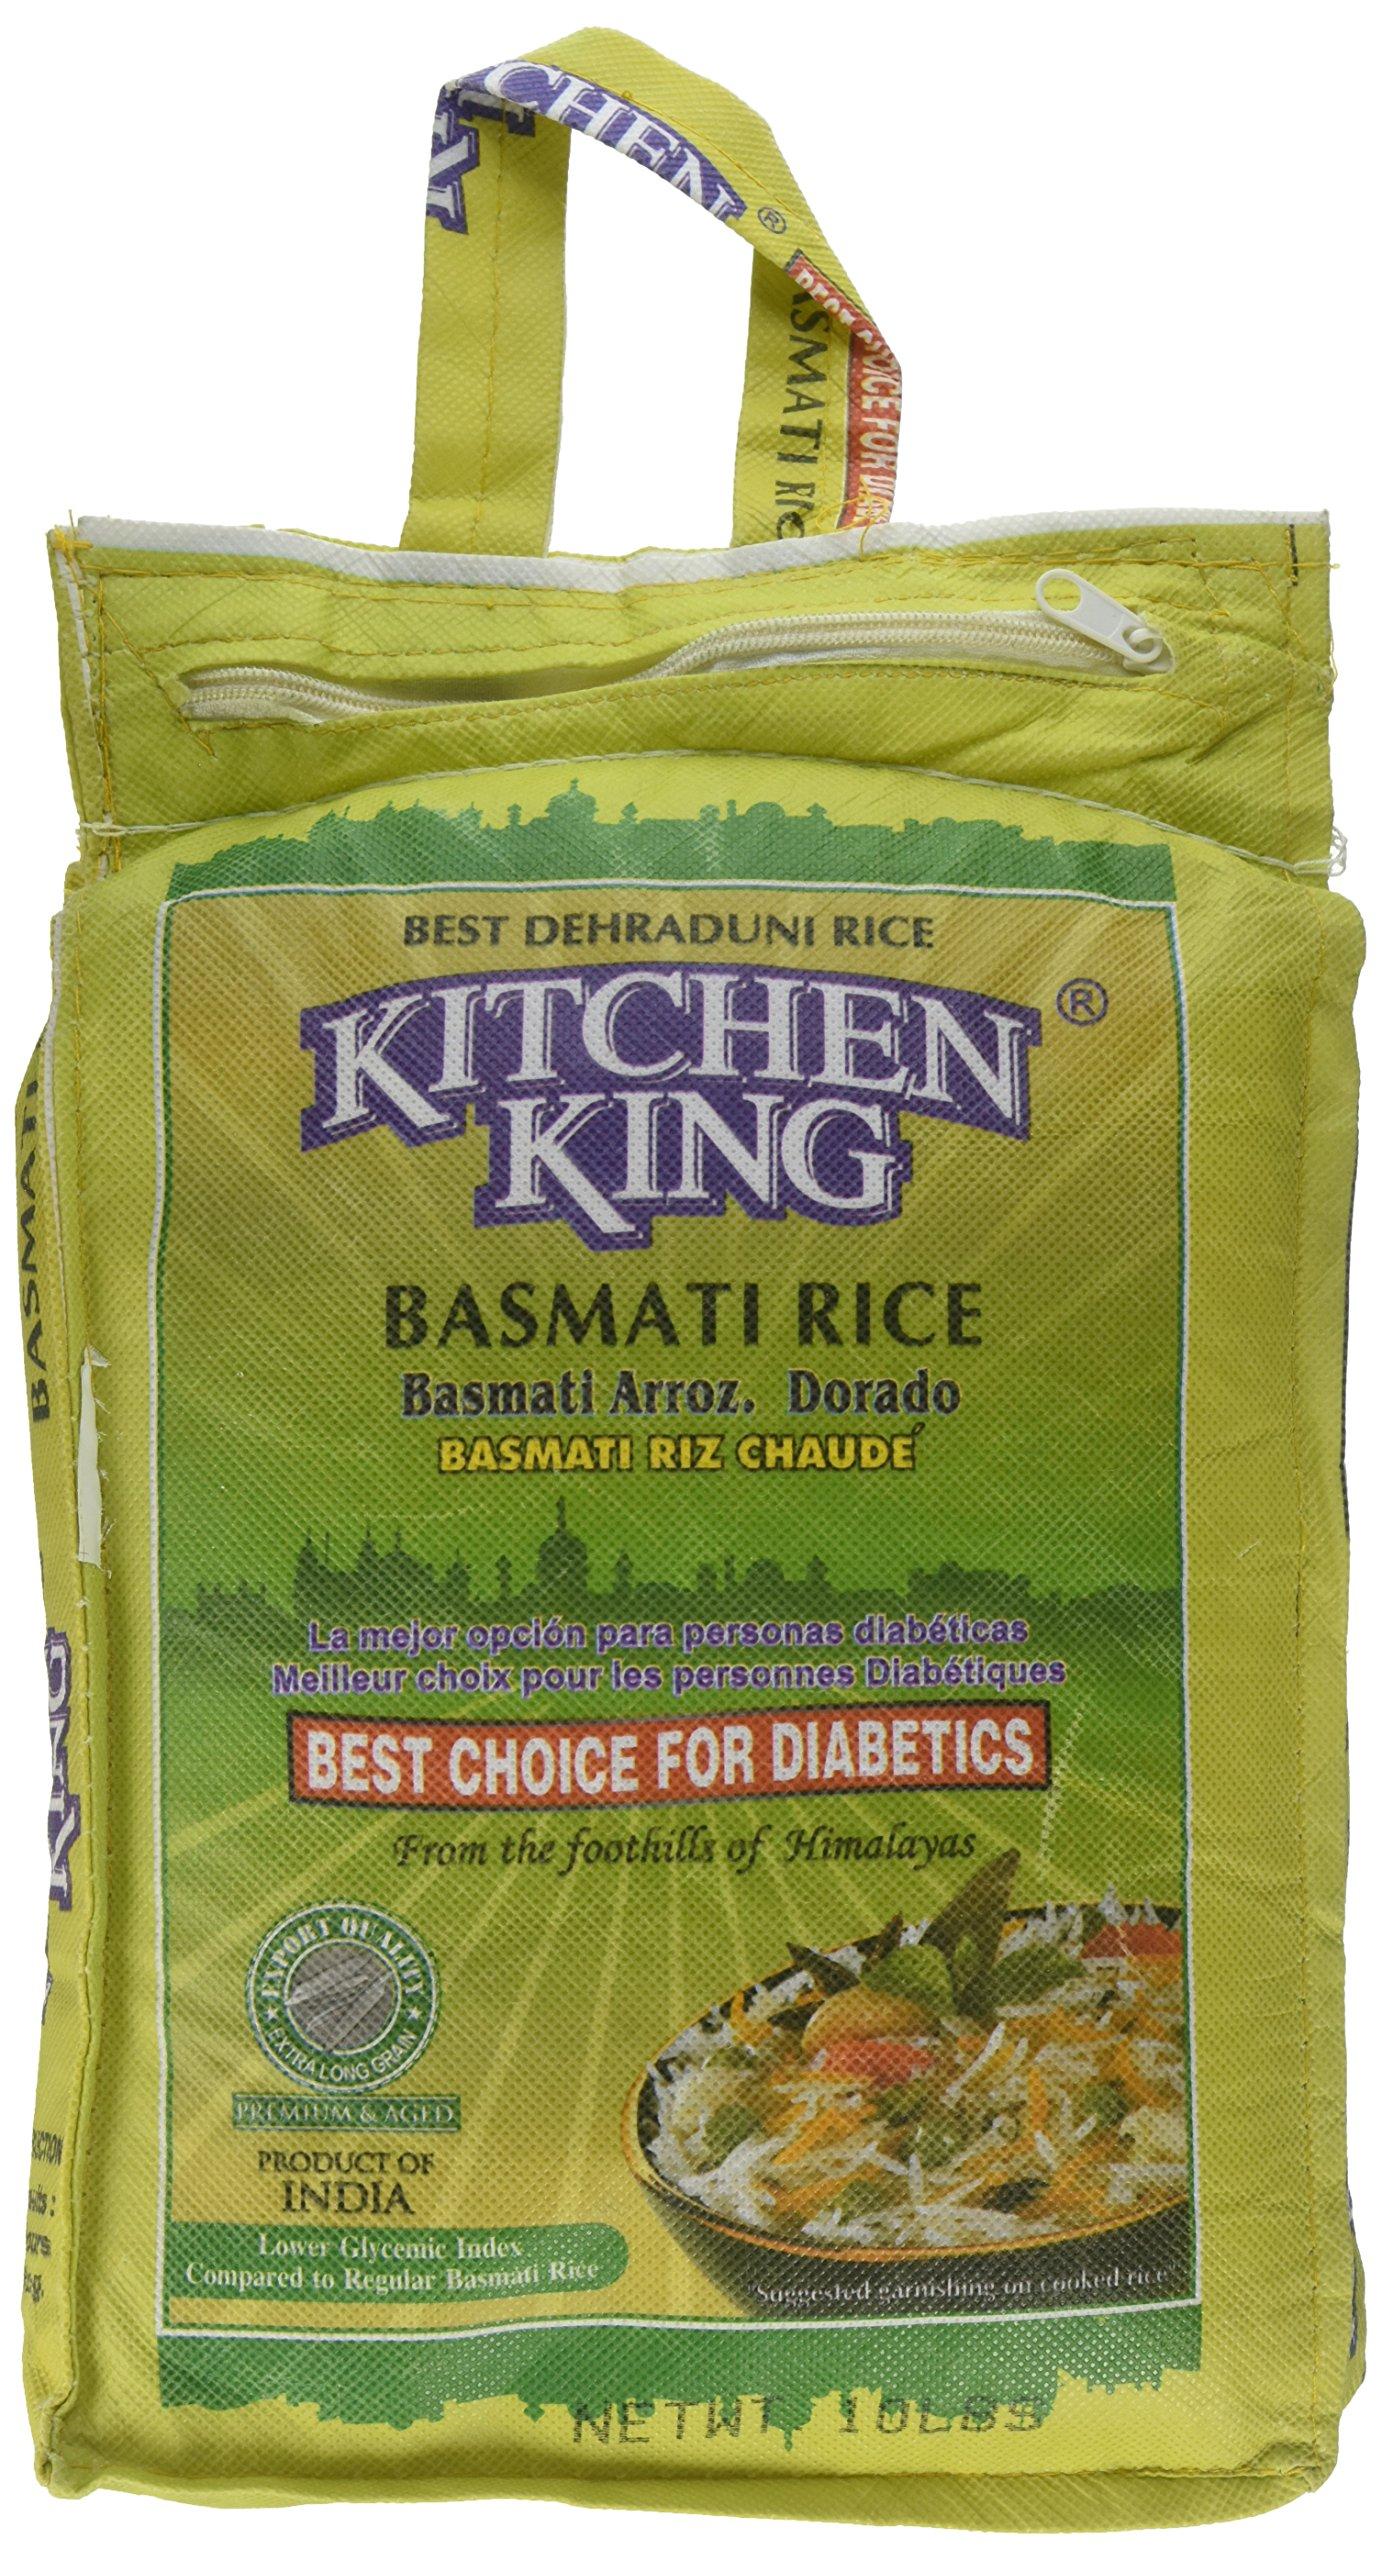 Kitchen King, Basmati Rice, 10 Pound(LB)